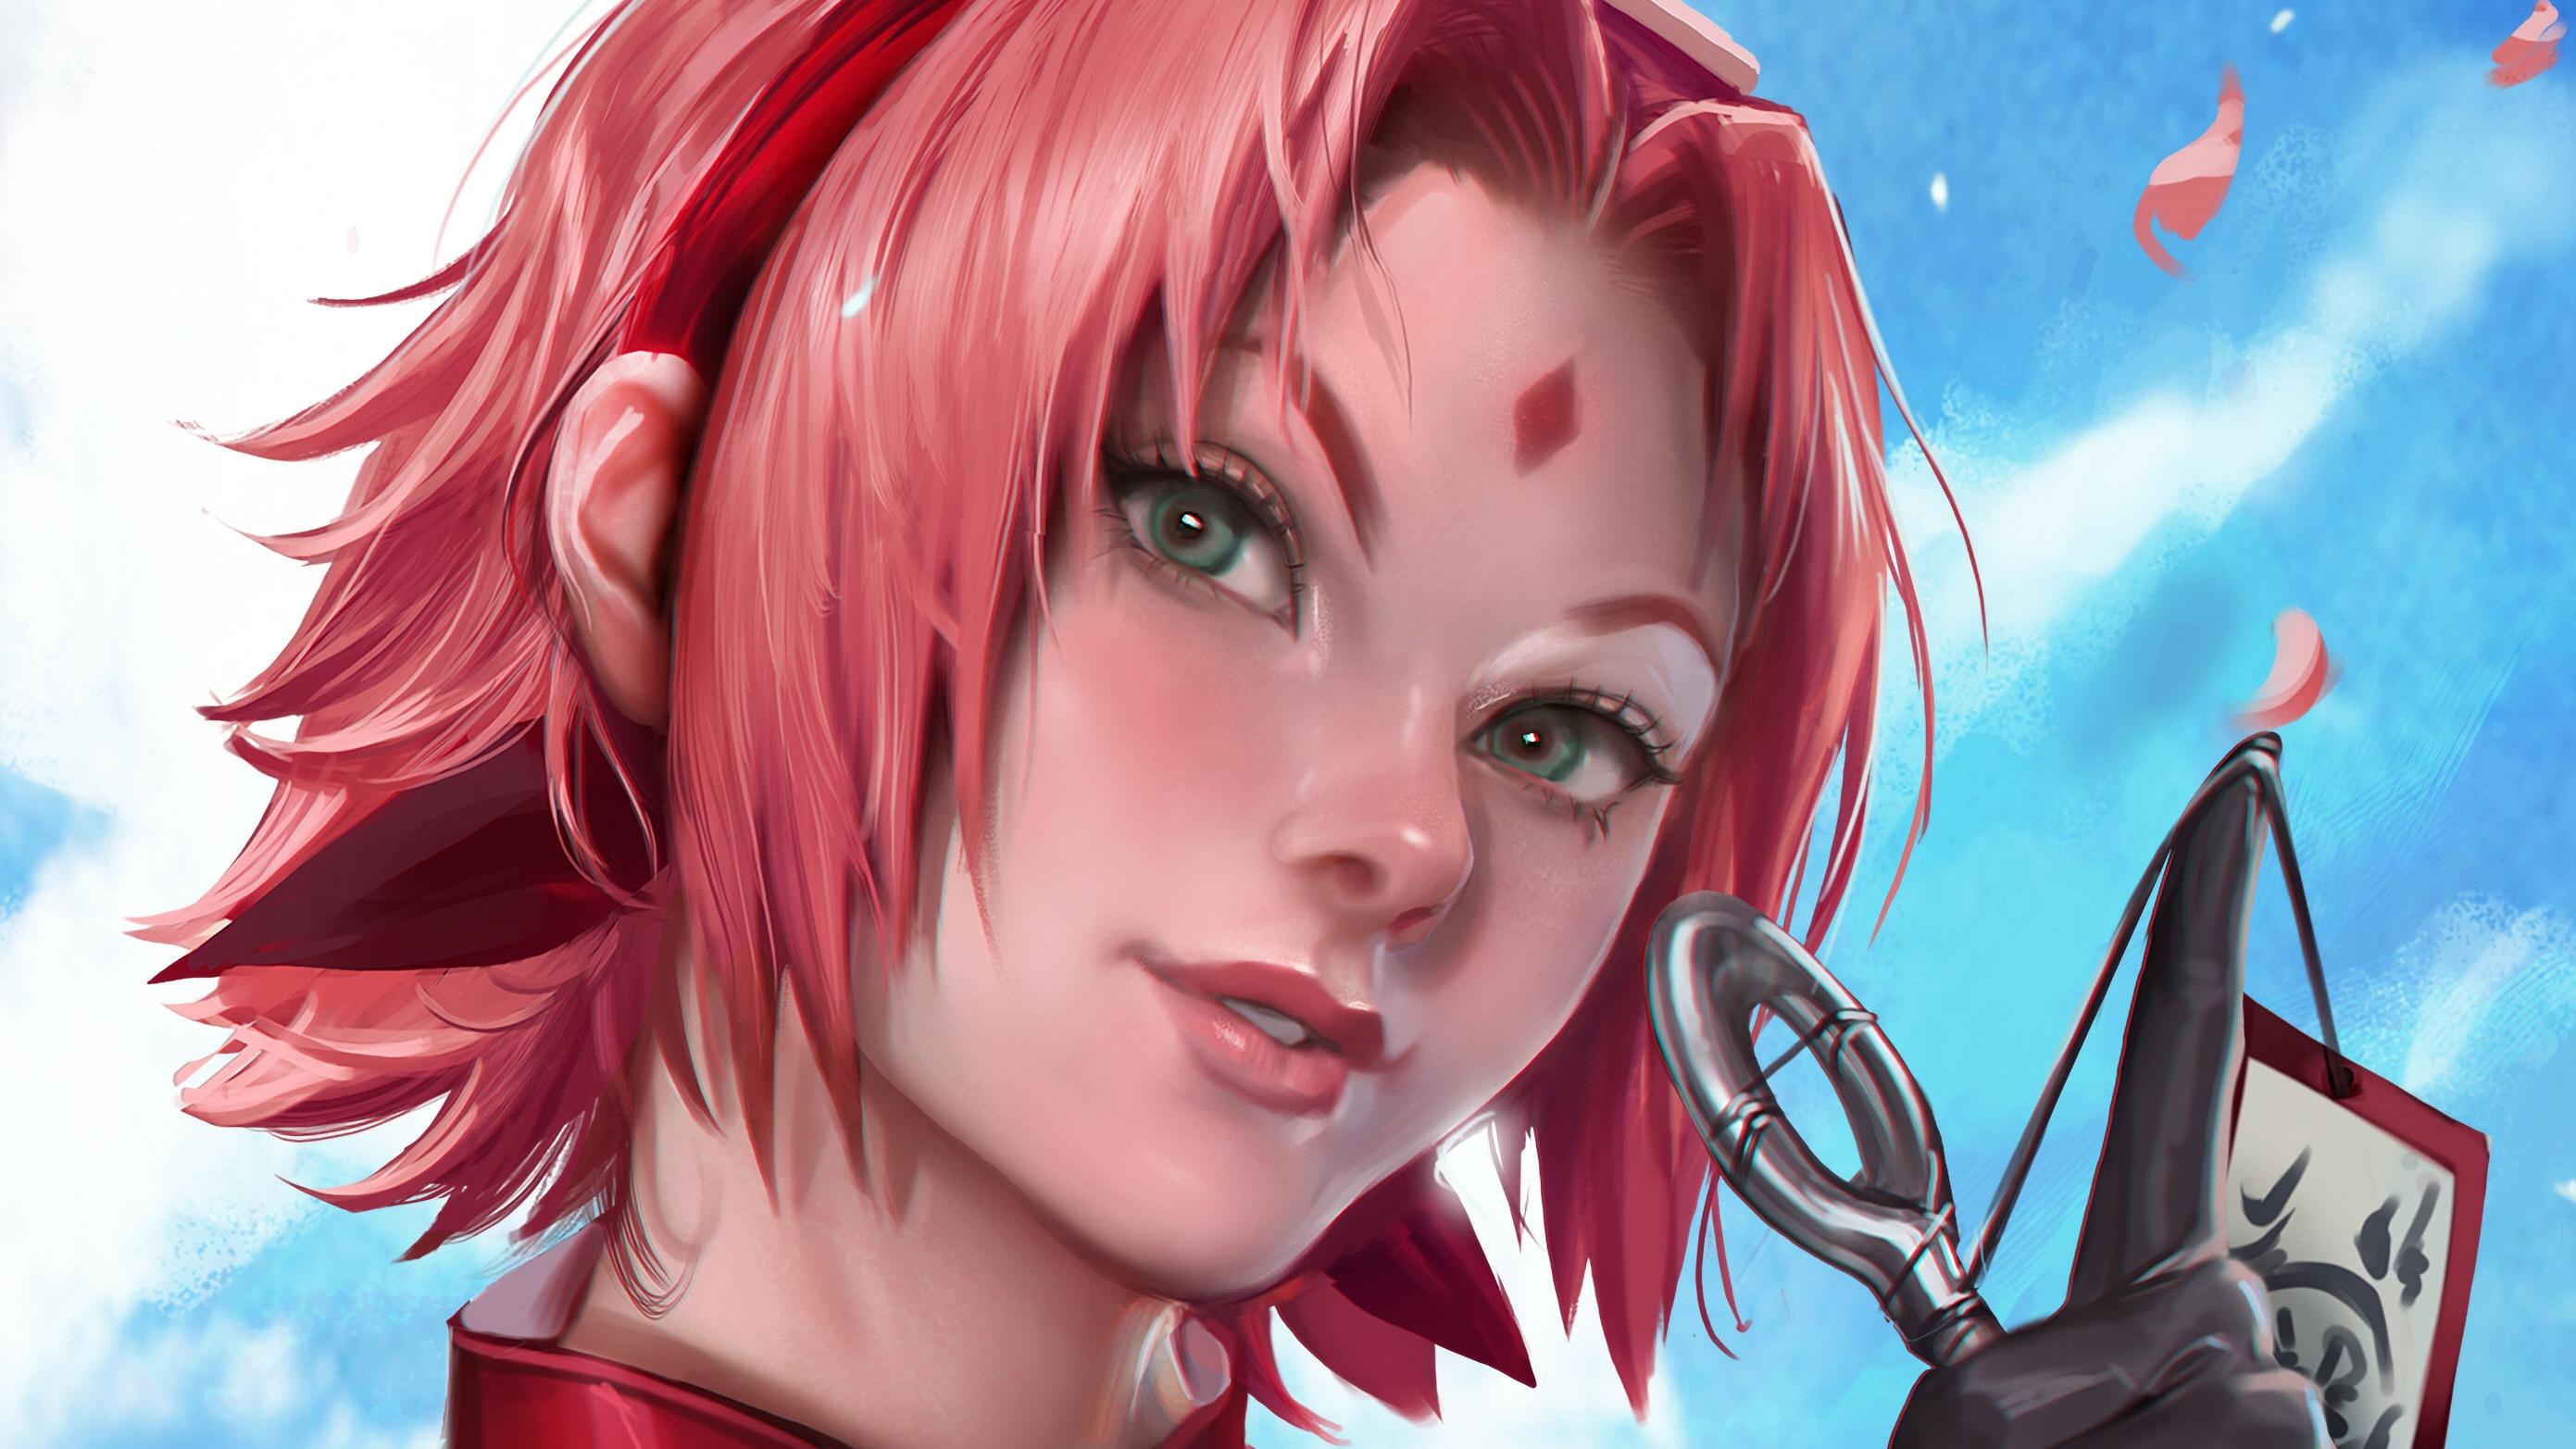 Face Girl Naruto Pink Hair Sakura Haruno Short Hair 2782x1565